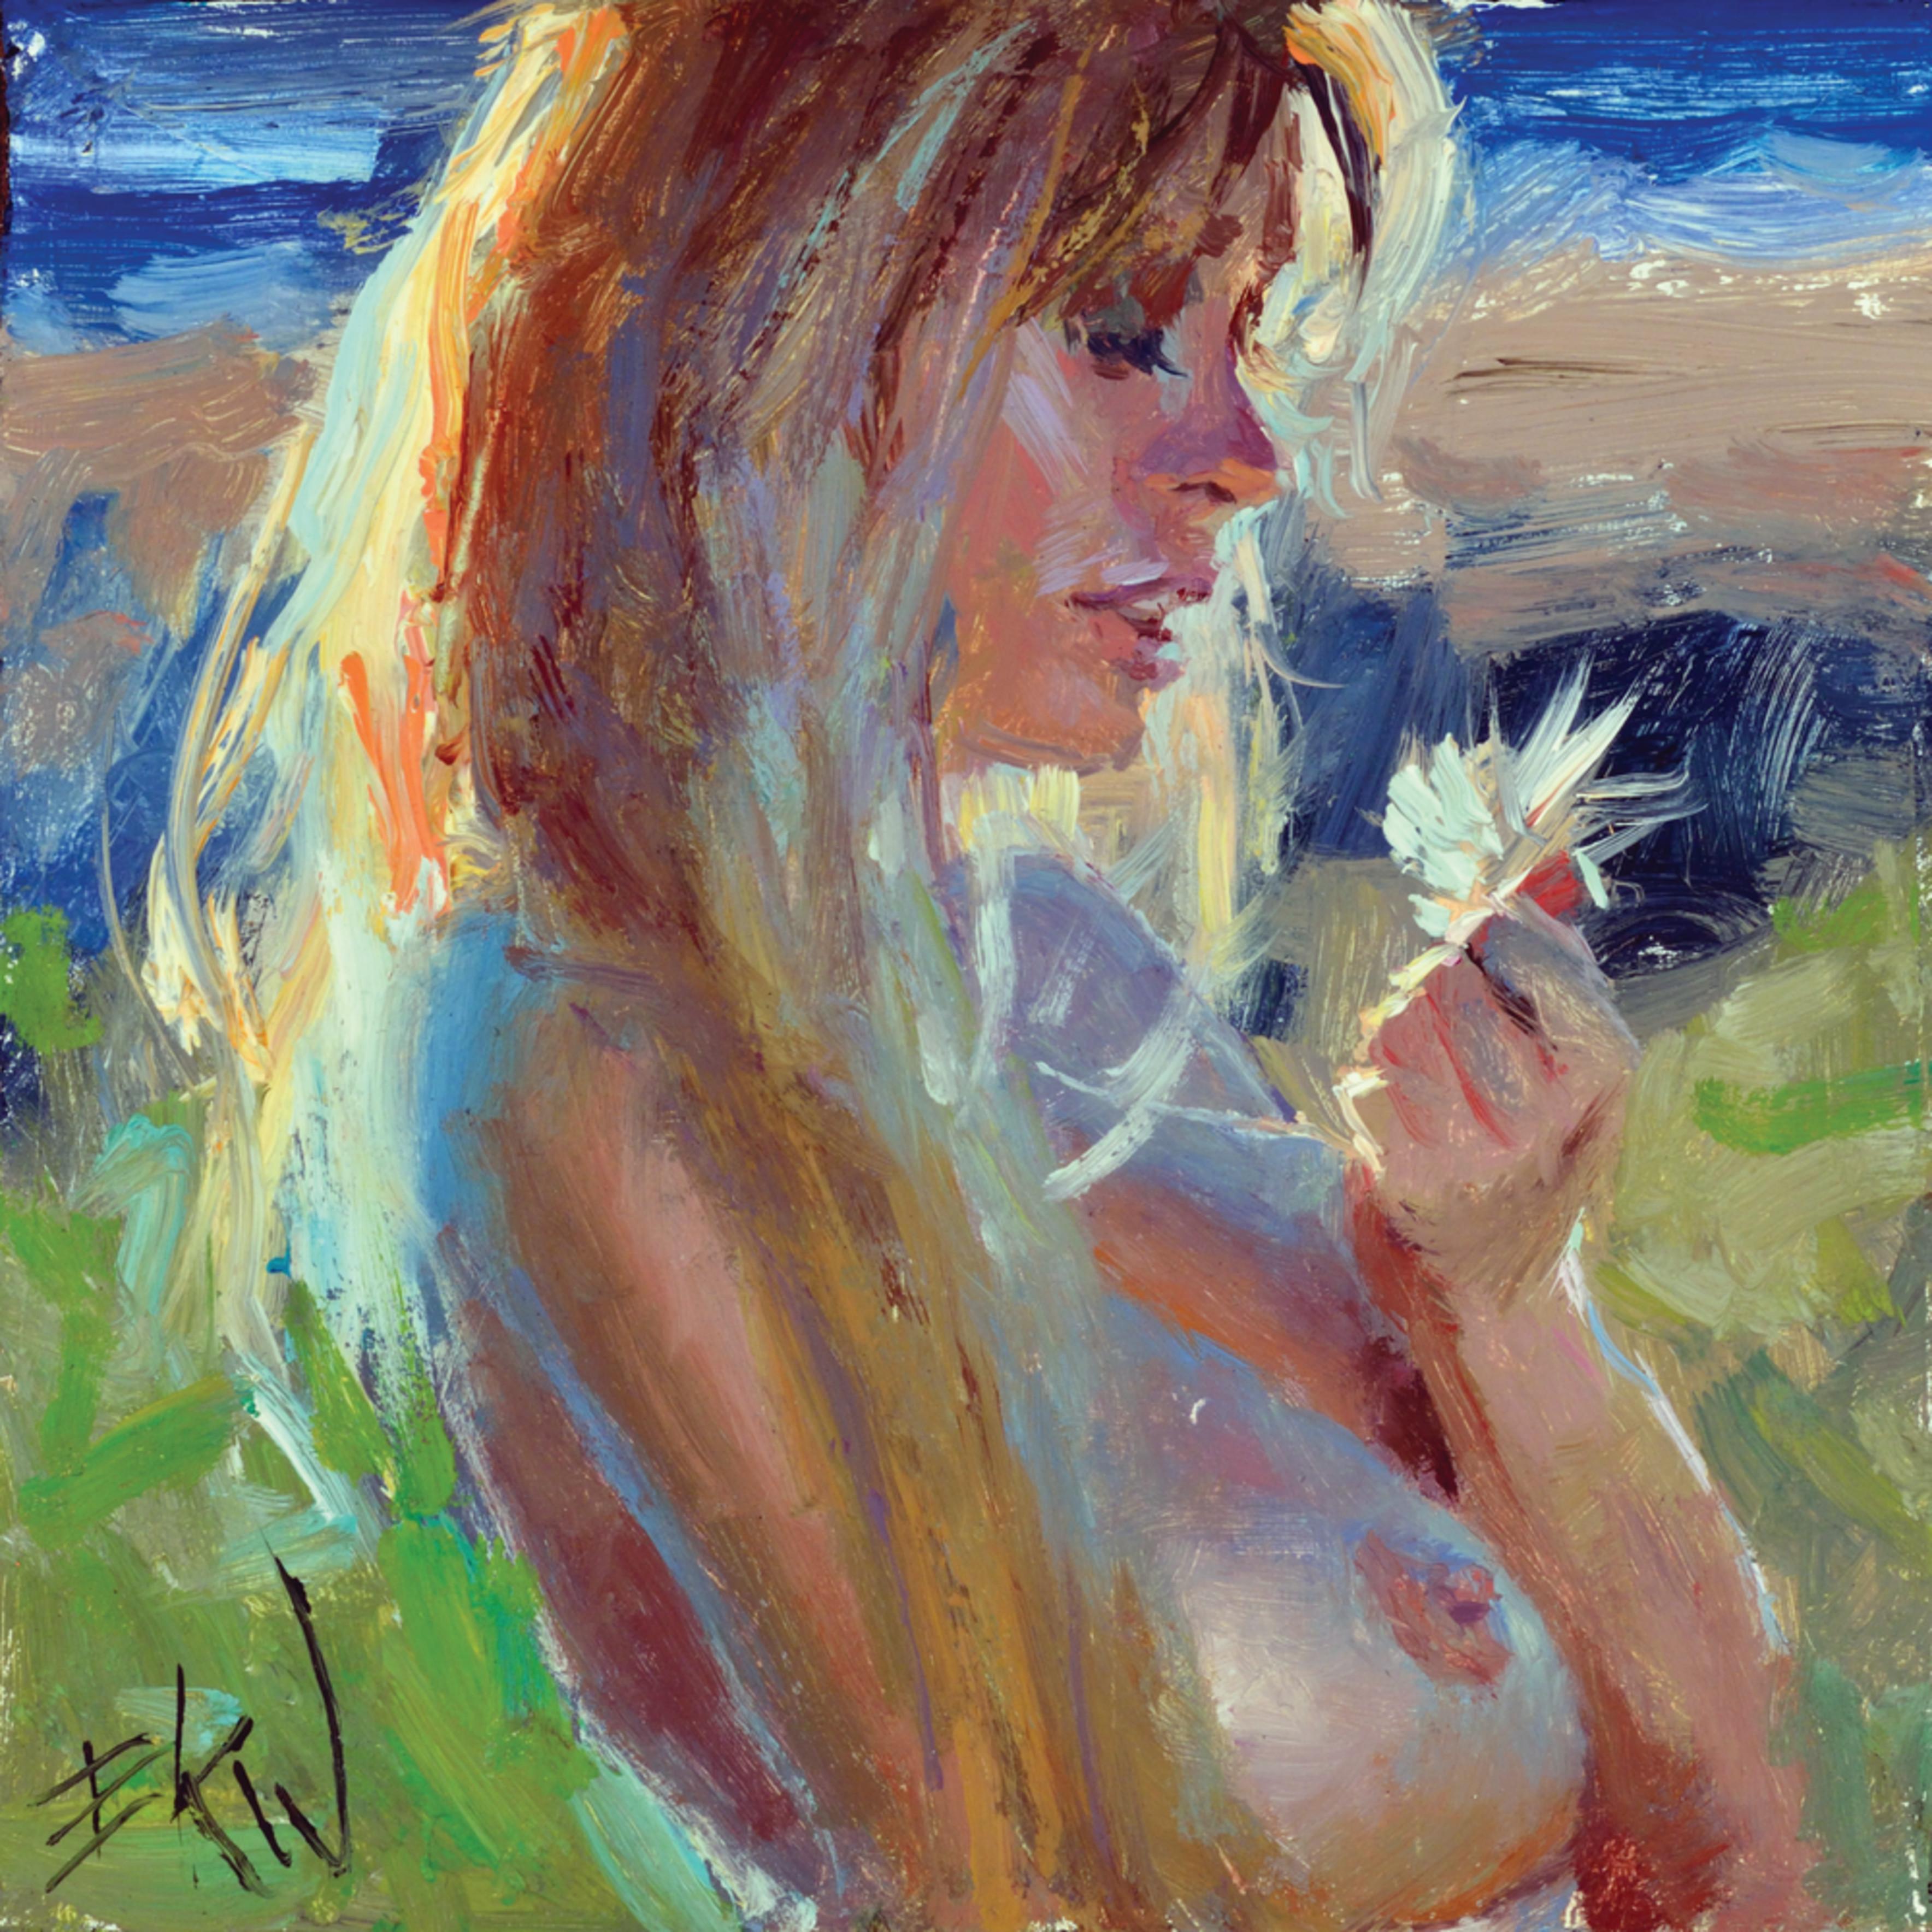 Beach blossom 4x4 v983yf